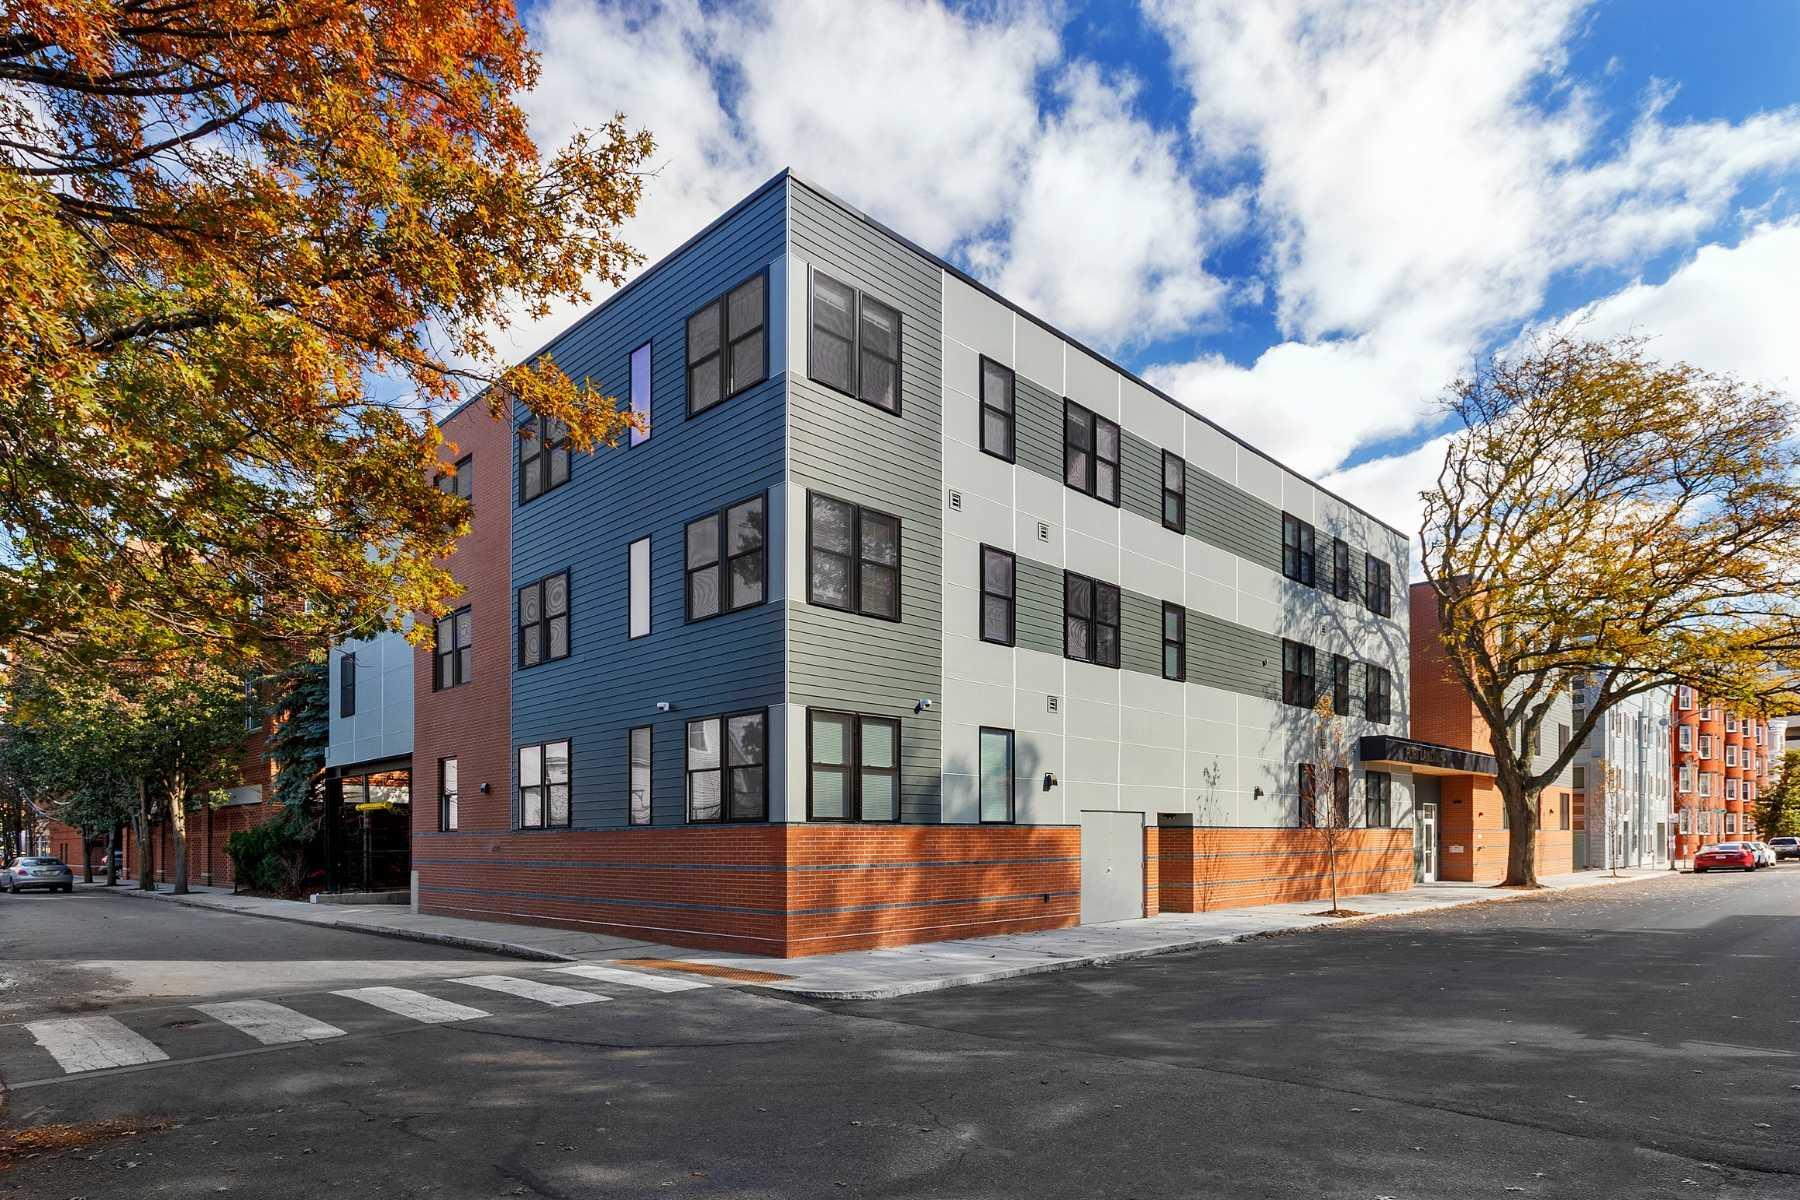 2-CapstoneCommunities-property-PortLanding-Cambridge.jpg